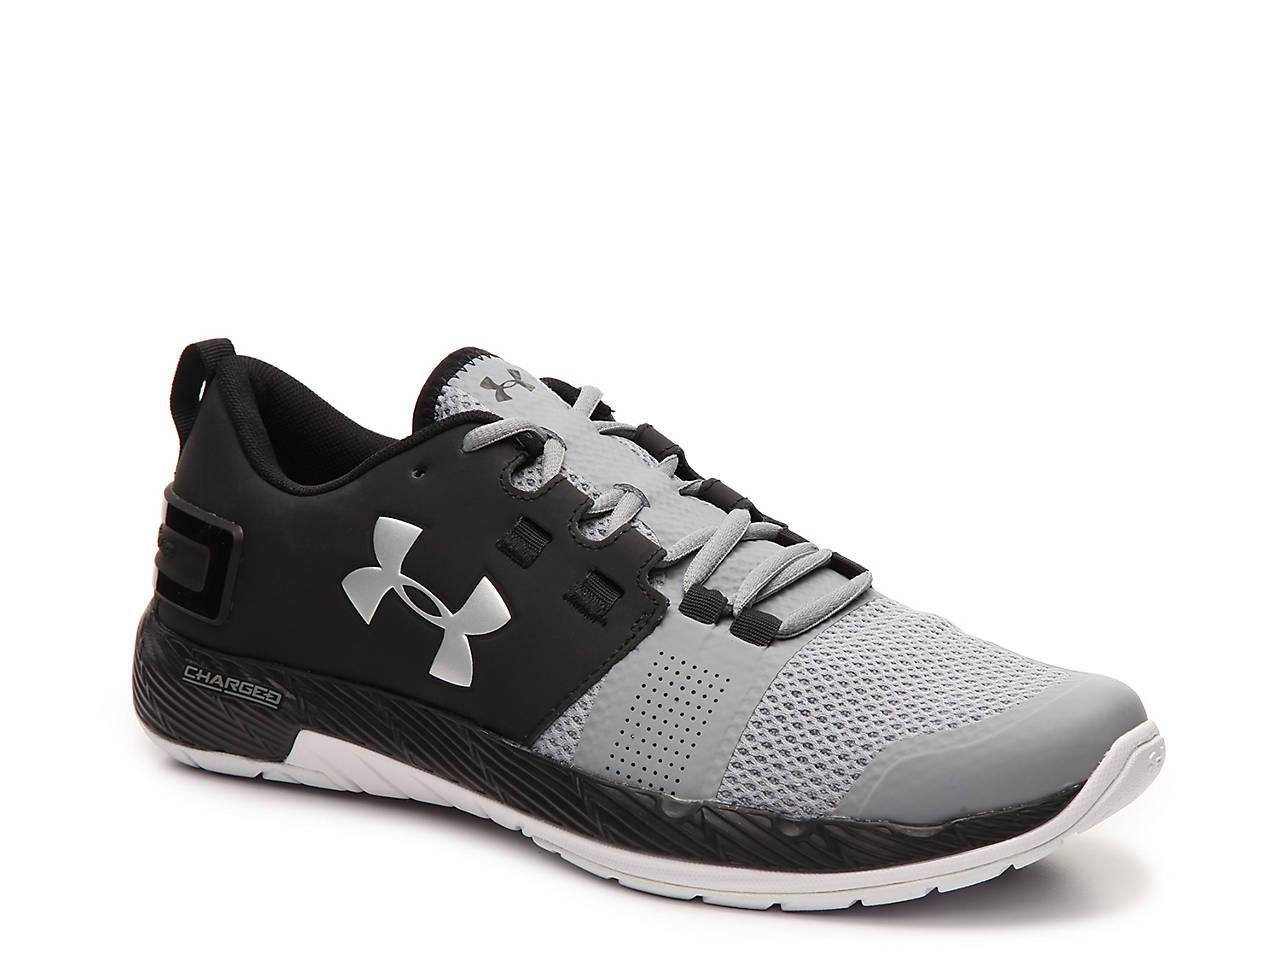 fb56e1af3aee ... Dsw Size  11 Commit Training Shoe - Mens Nike ...